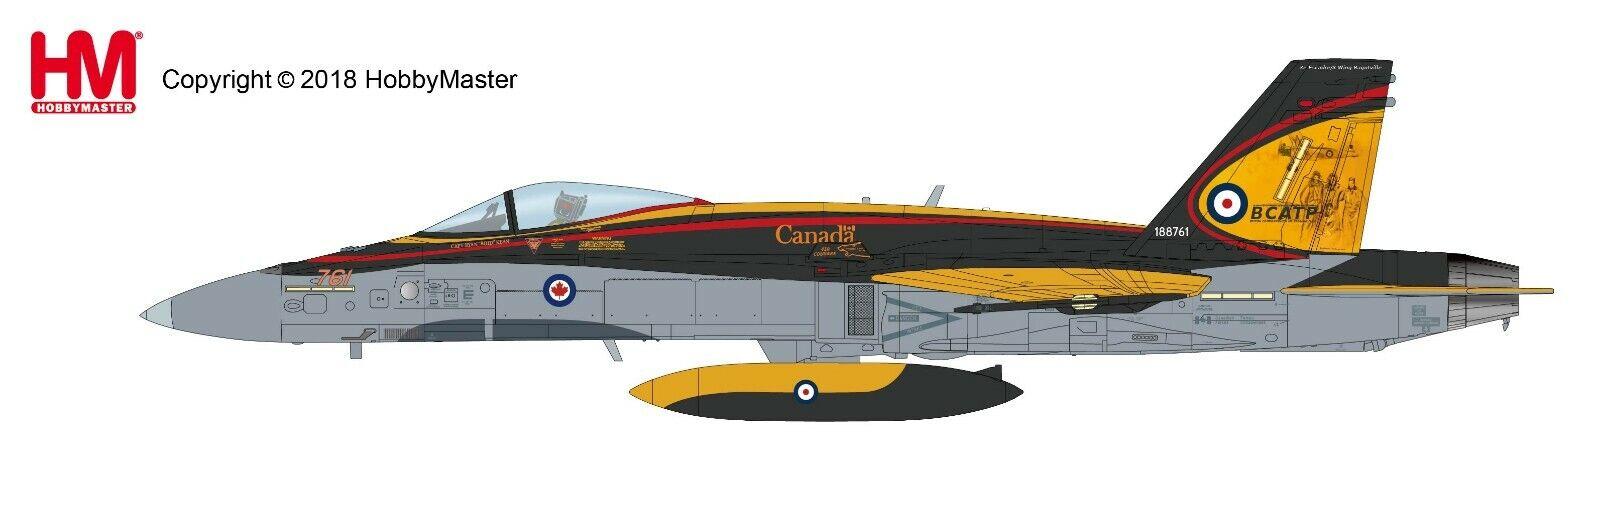 Hobby Master HA3550, CF-188  2016 DEMO  Capitaine Ryan  MOU  Kean, 2016